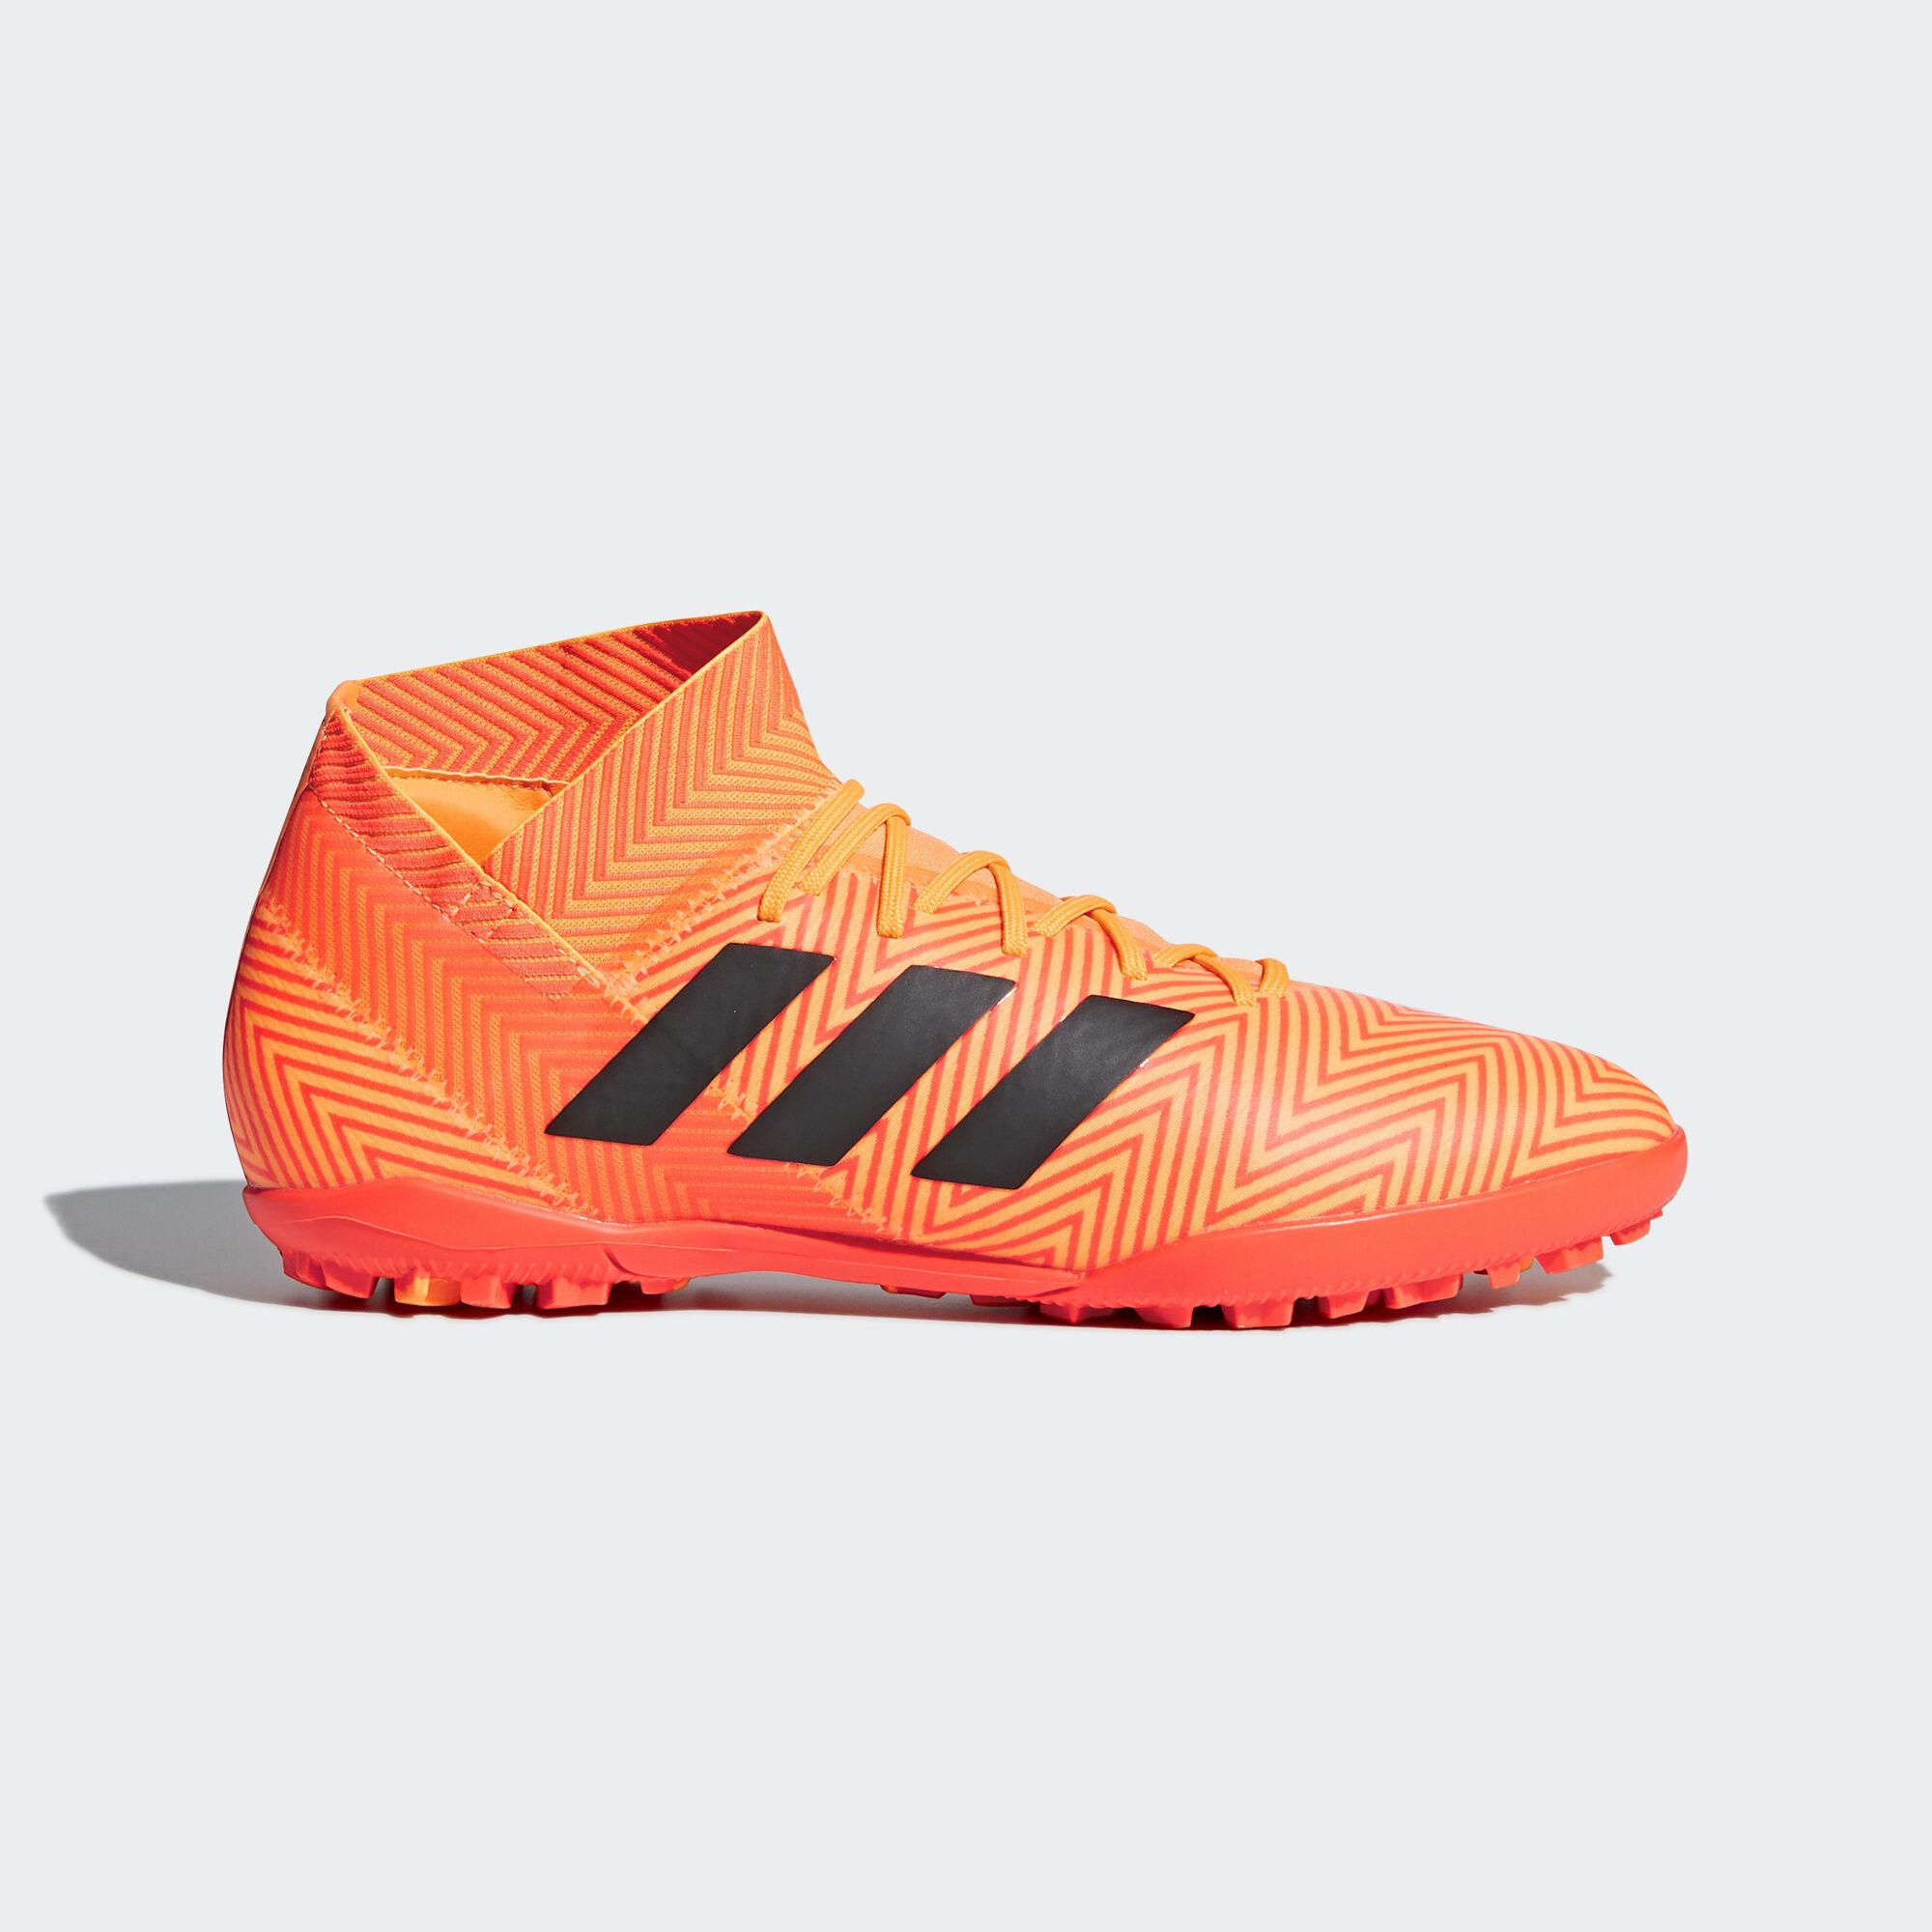 adidas Nemeziz Tango Turf Boots Orange adidas Europe Africa